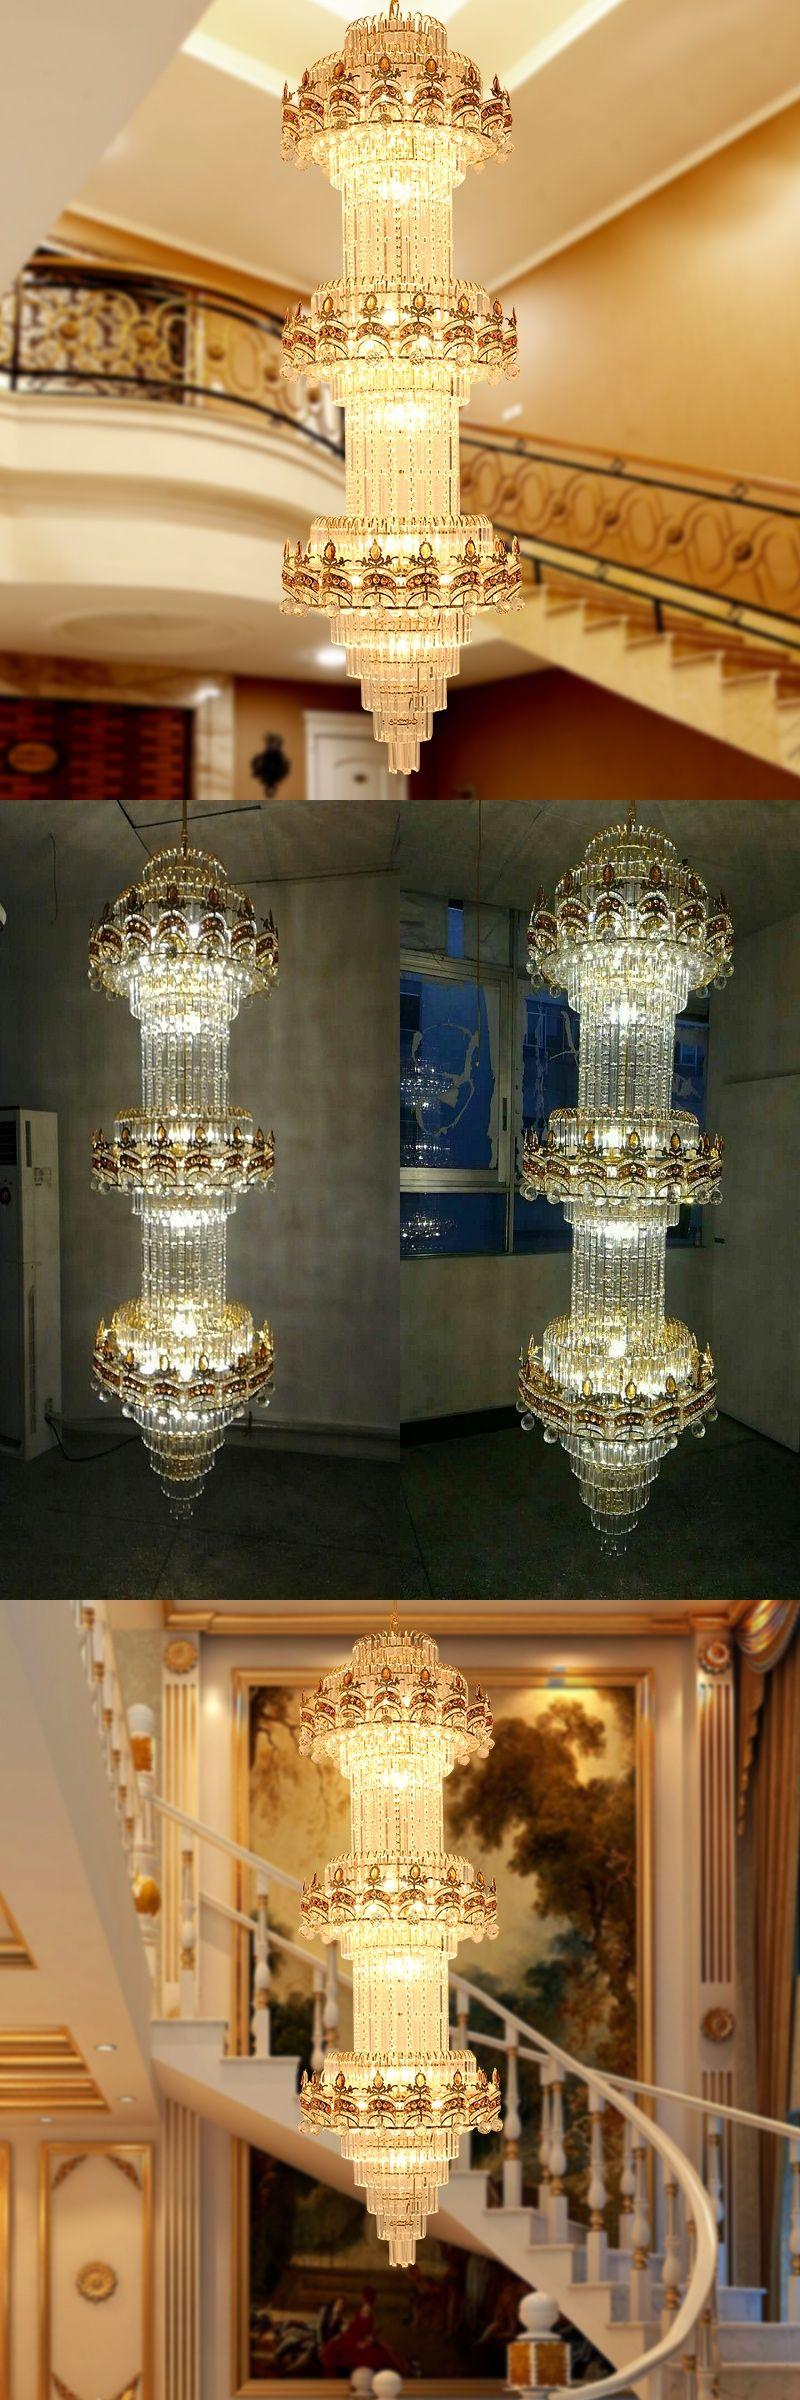 Lustre Stair Chandelier K9 Gold Crystal Chandelier Modern Led